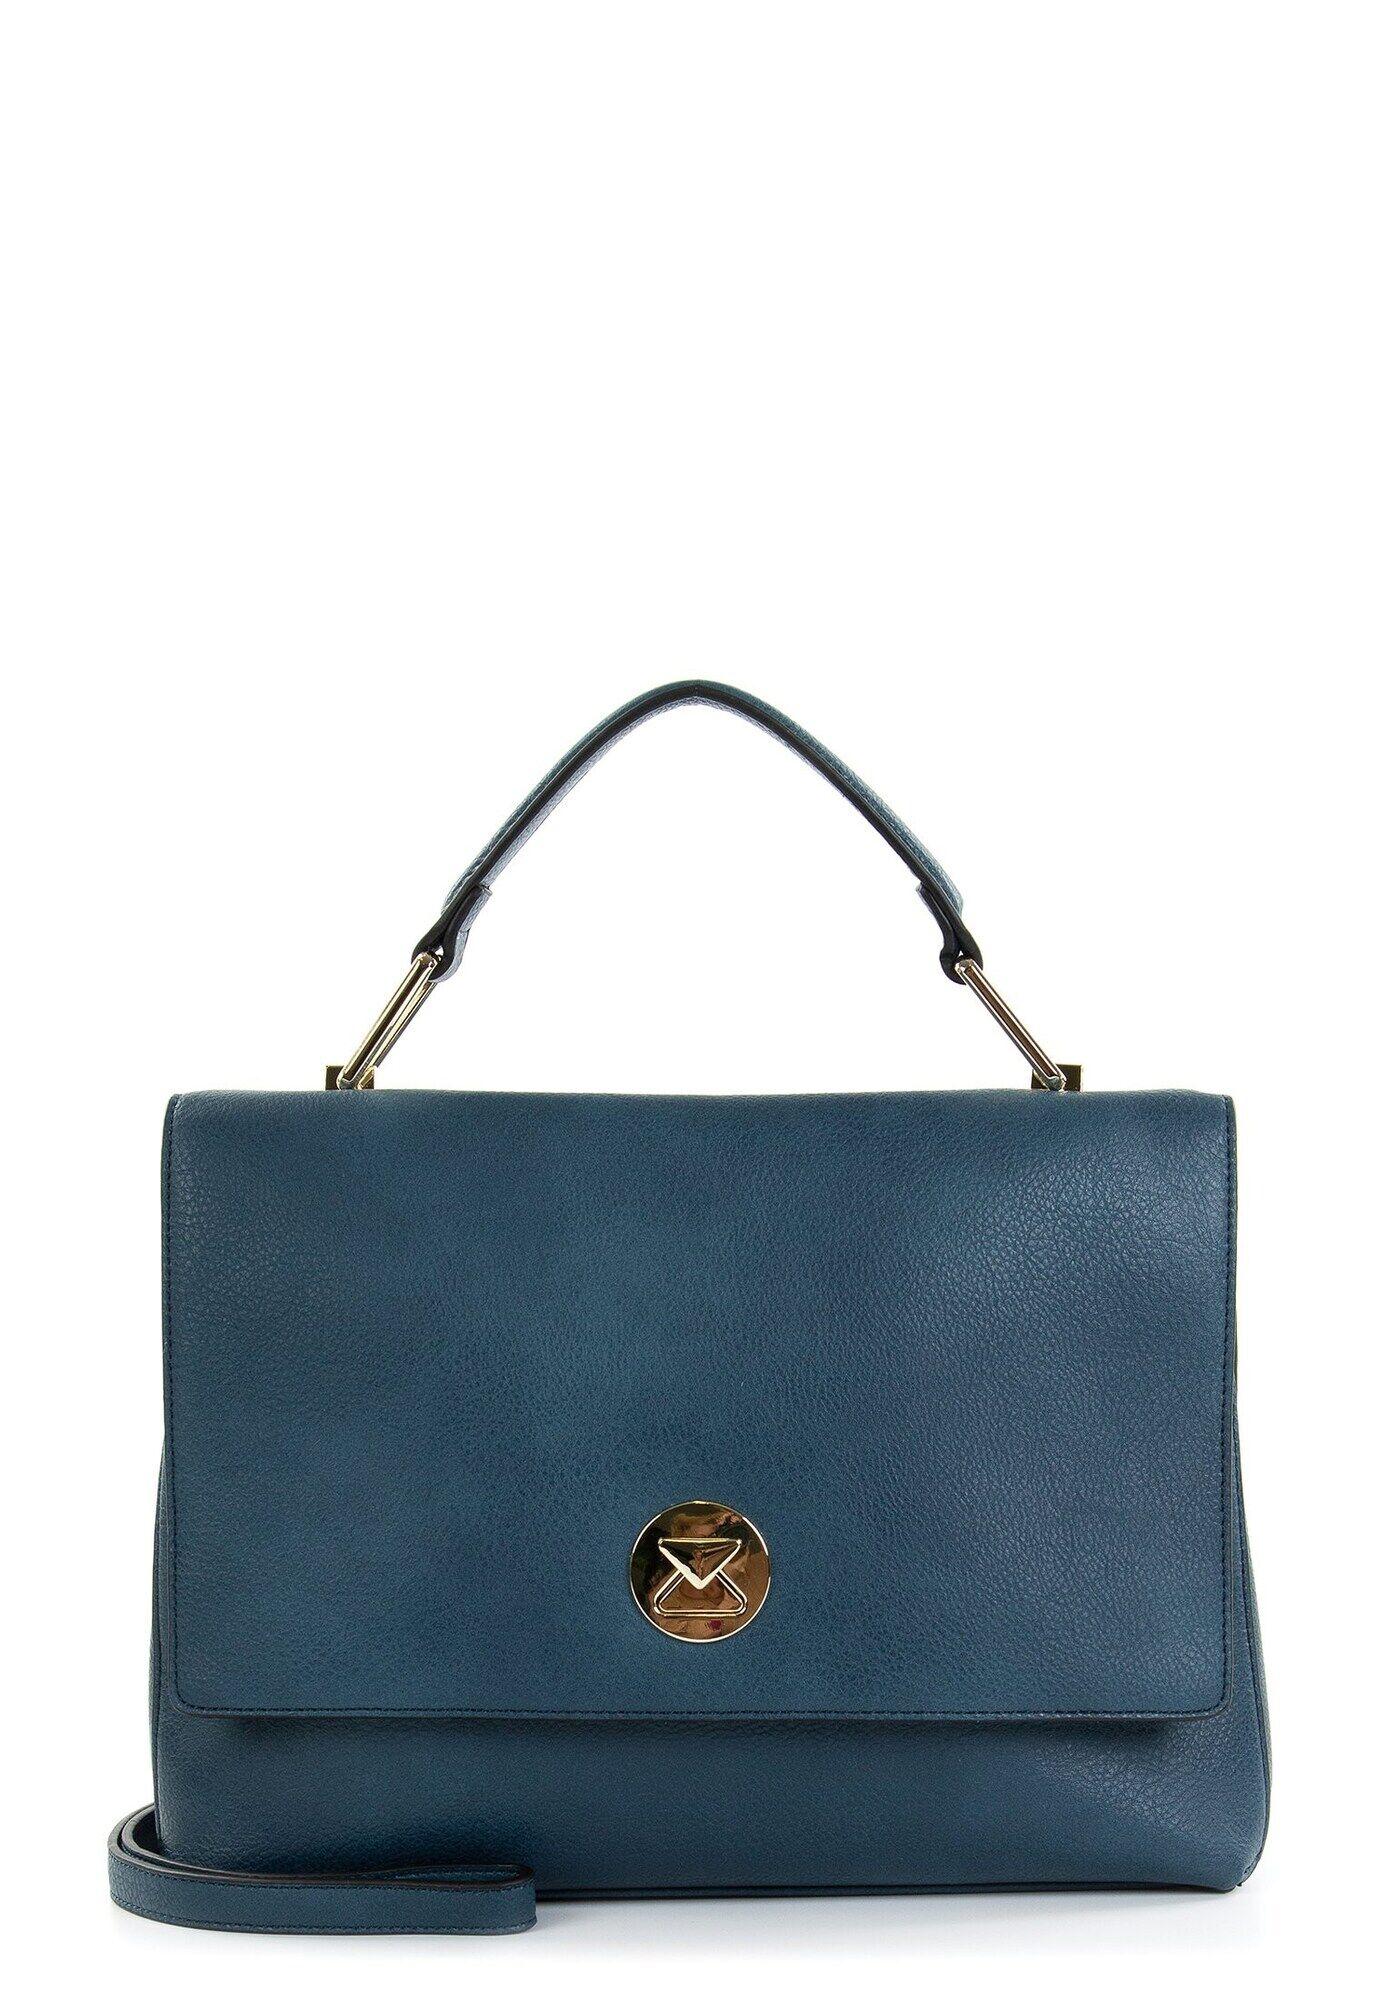 TAMARIS Sac à bandoulière 'Dagmara'  - Bleu - Taille: One Size - female